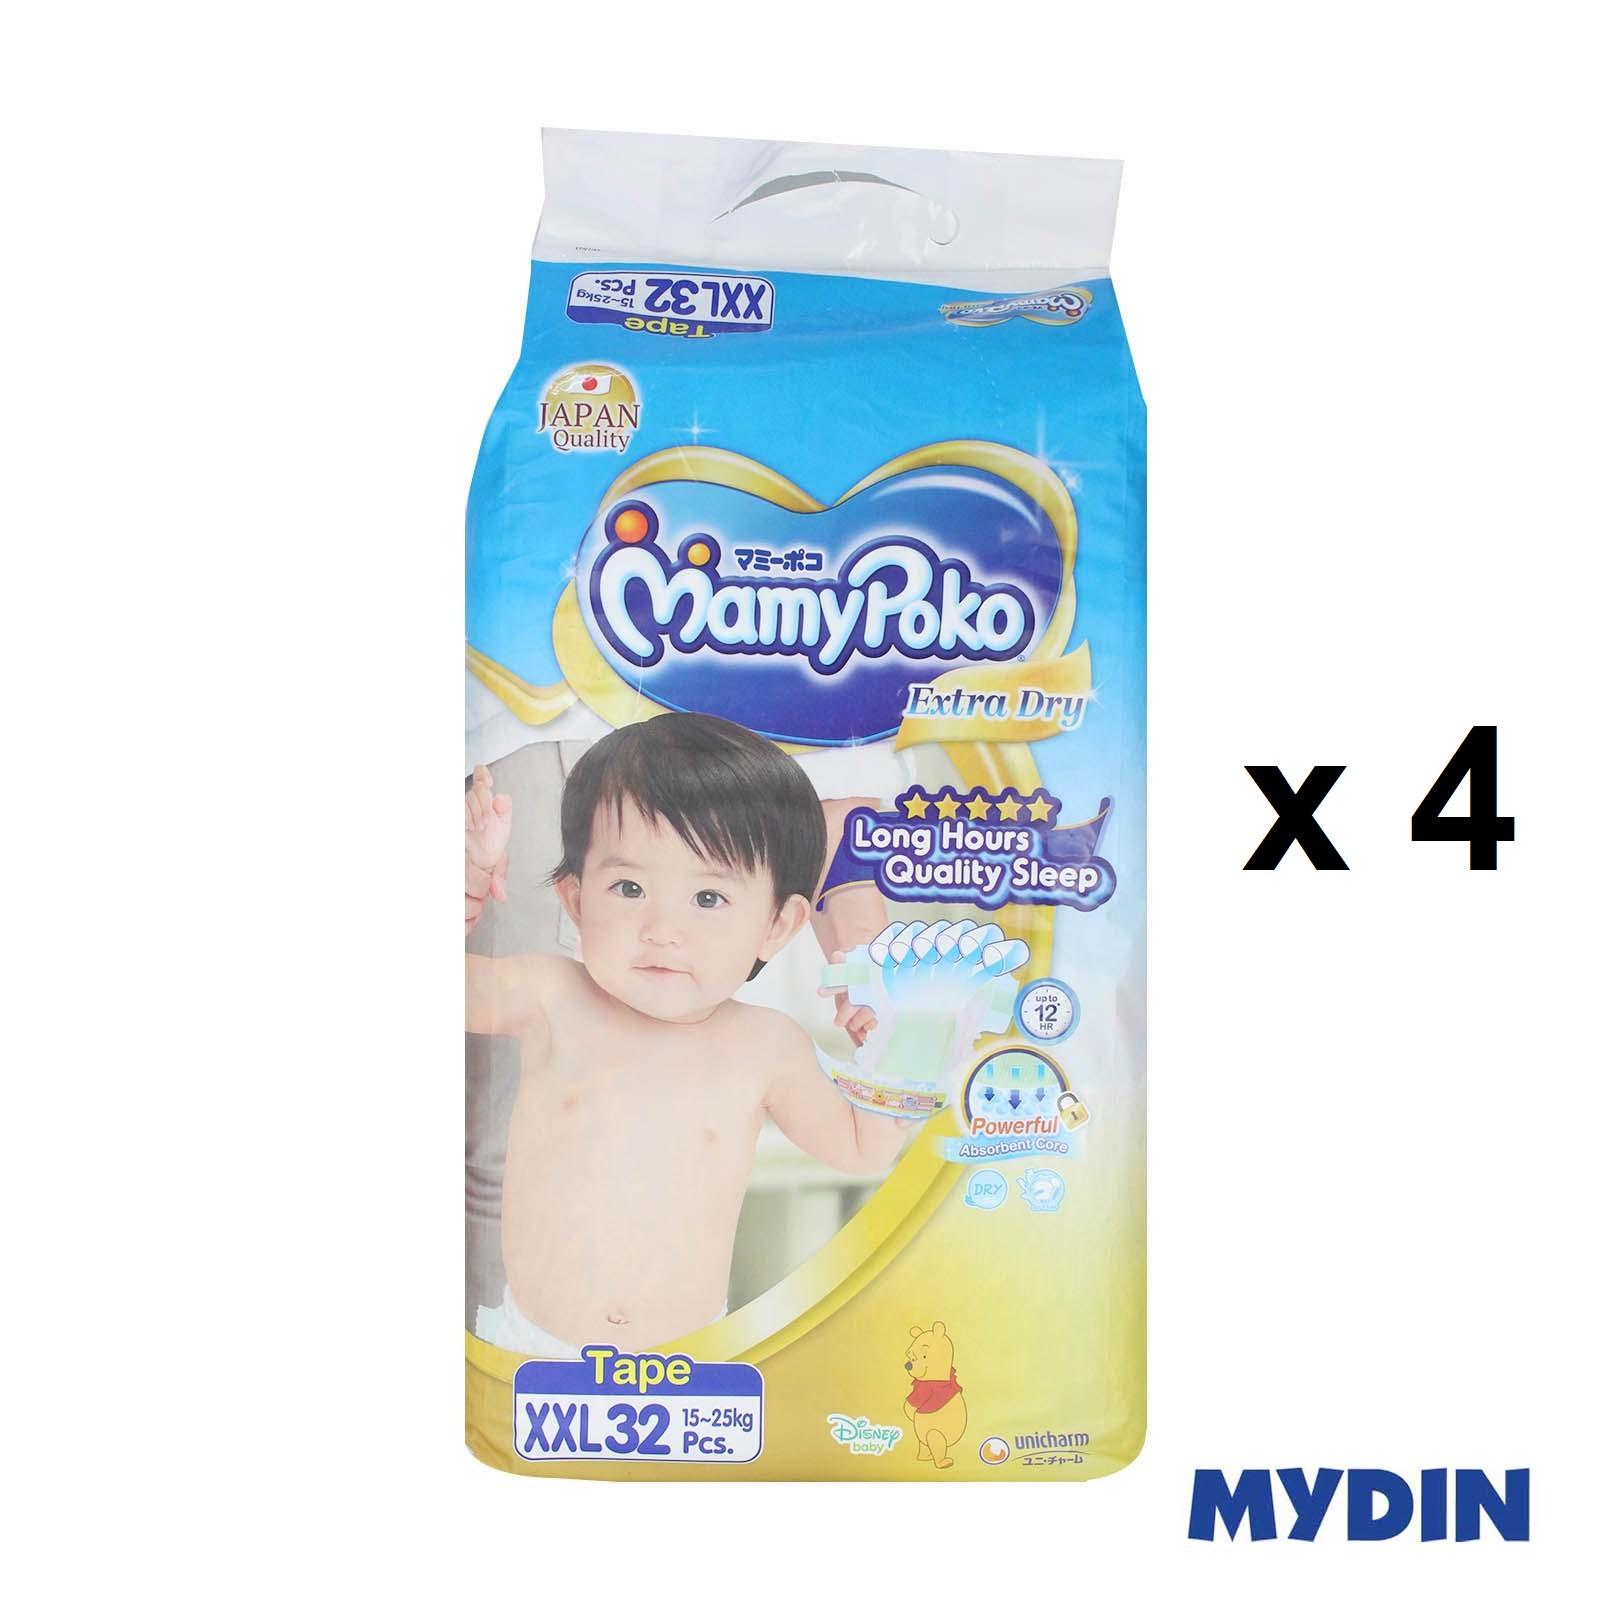 Mamypoko Open Tape Extra Dry XXL32 x 4 Packs